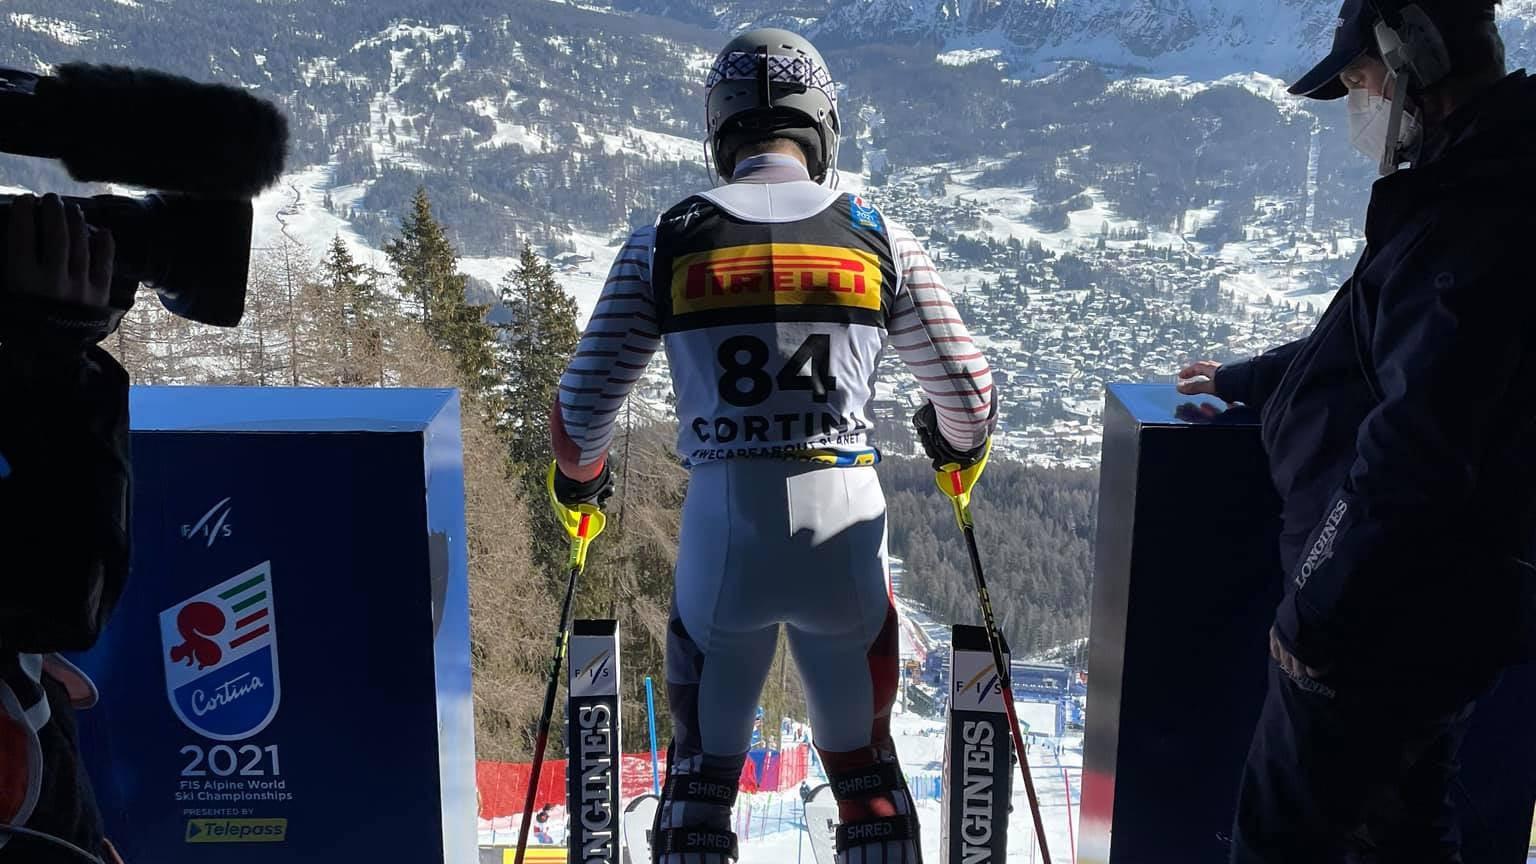 Magyar bravúr az alpesi sí világbajnokságon